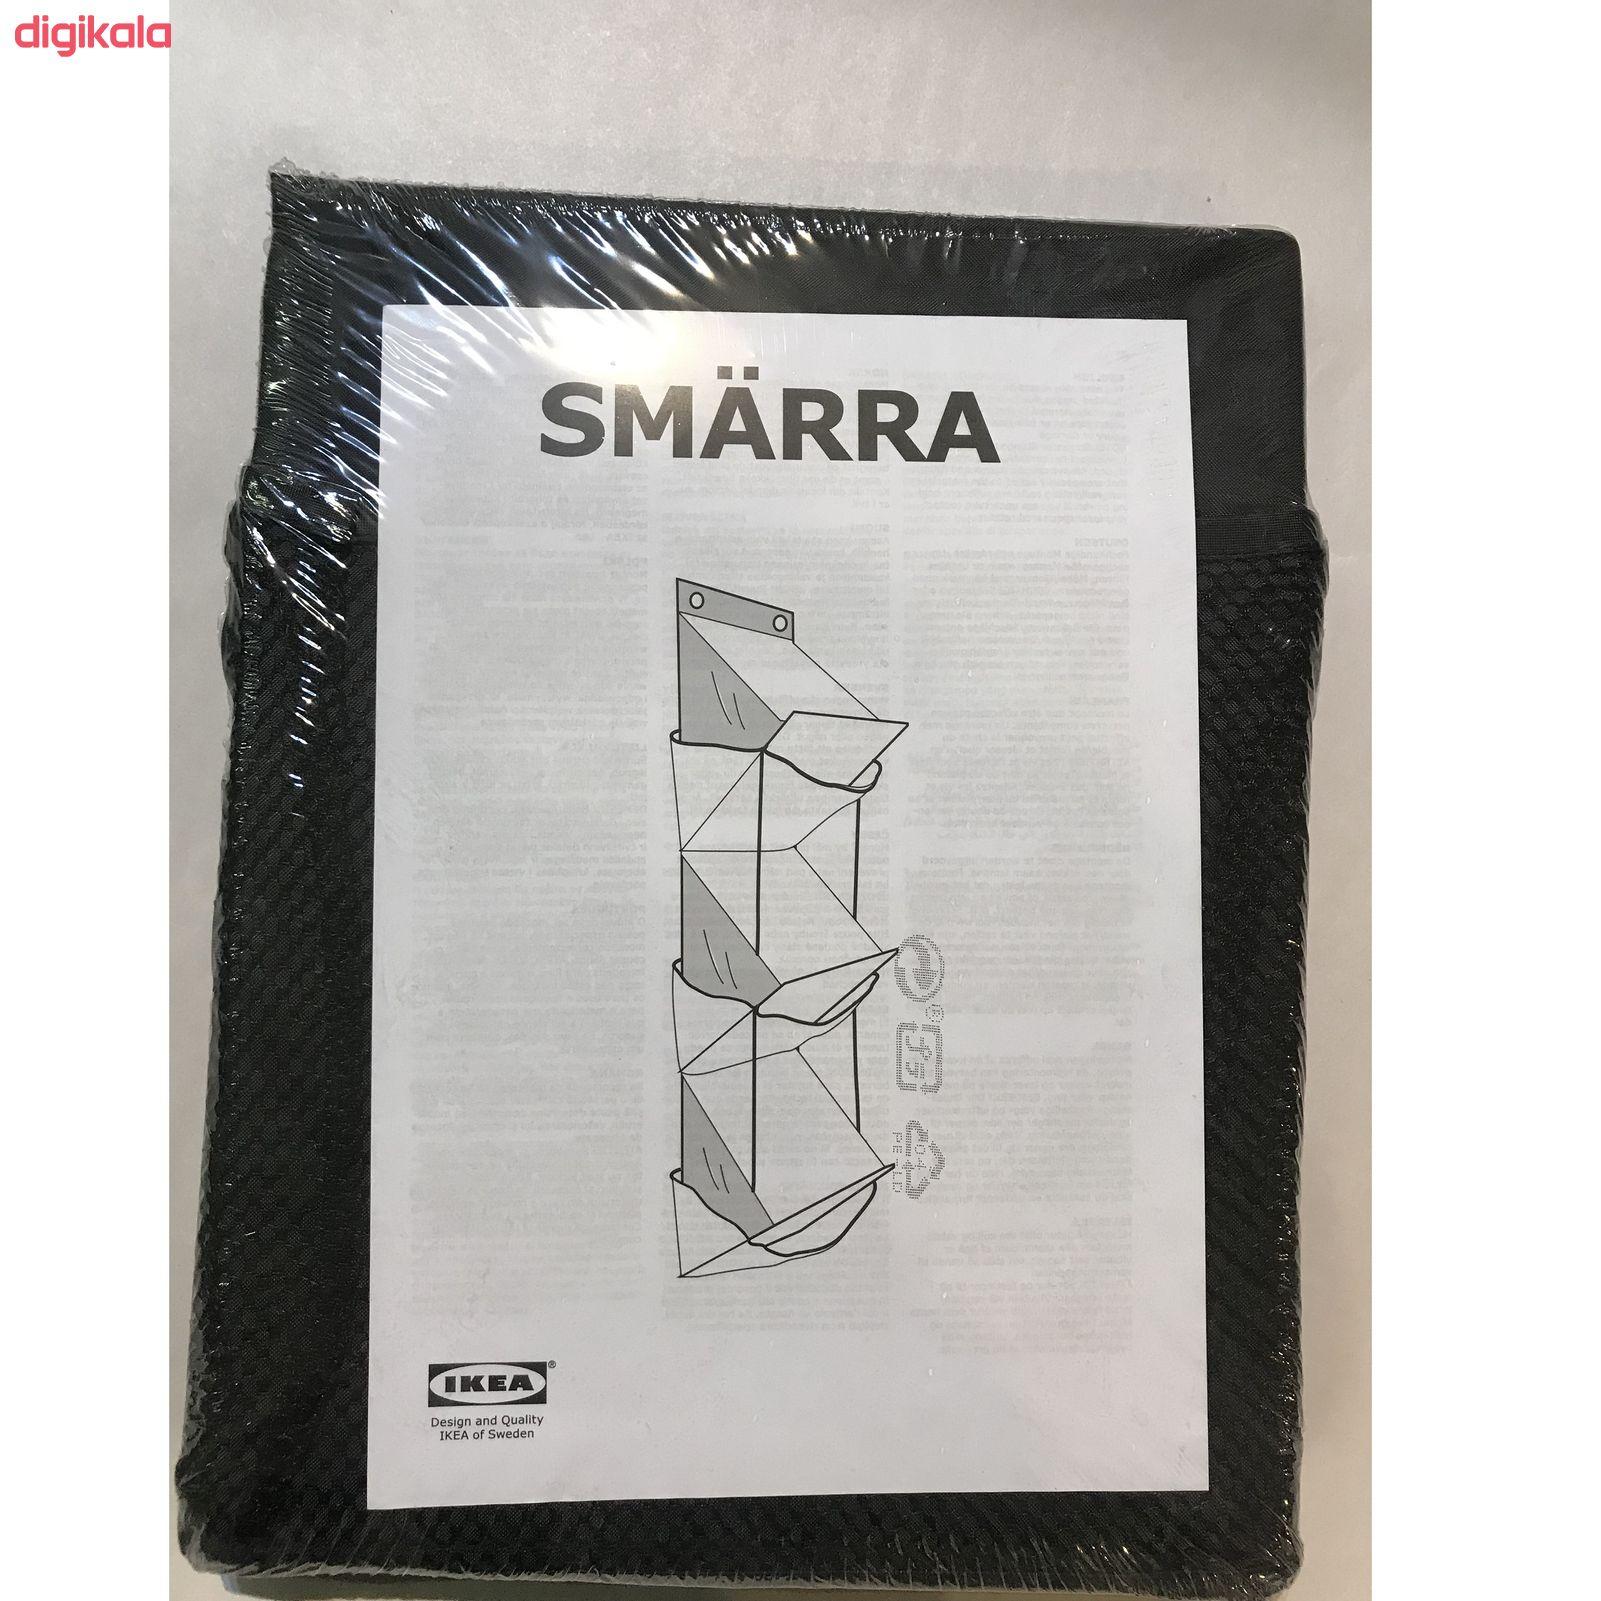 ارگانایزر ایکیا مدل SMARRA کد 203.991.74  main 1 1